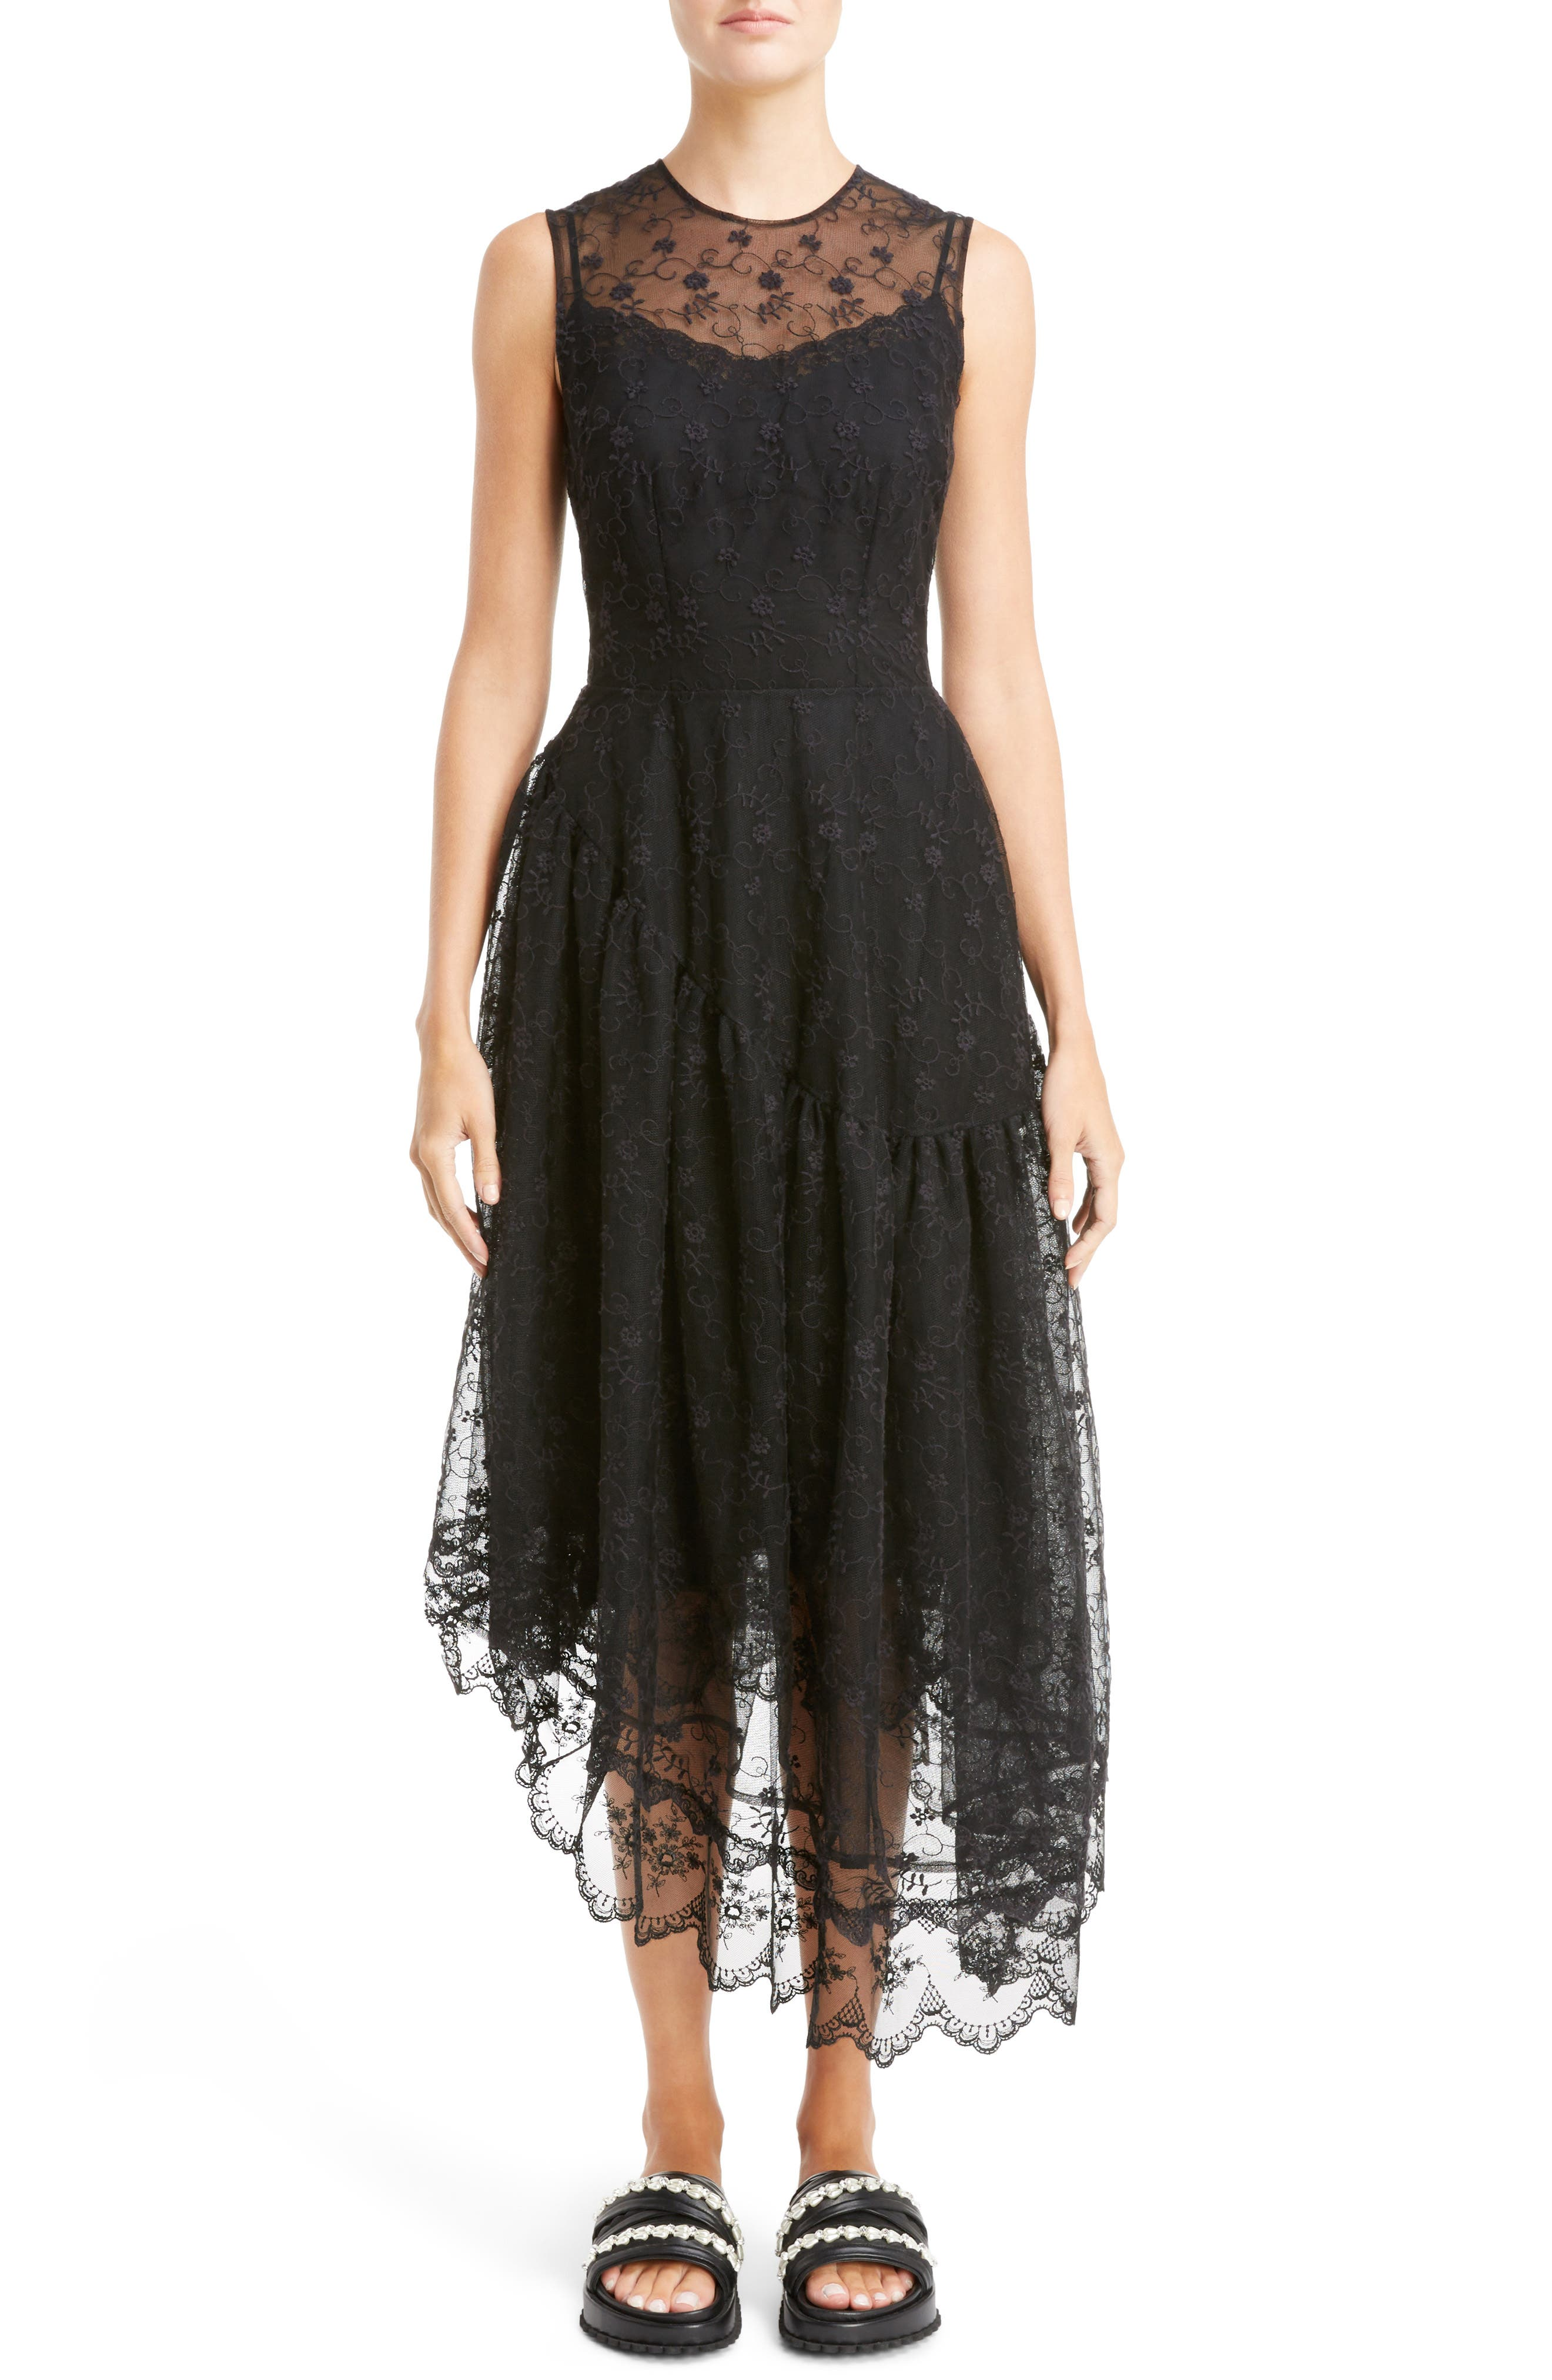 Simone Rocha Asymmetrical Embroidered Tulle Dress